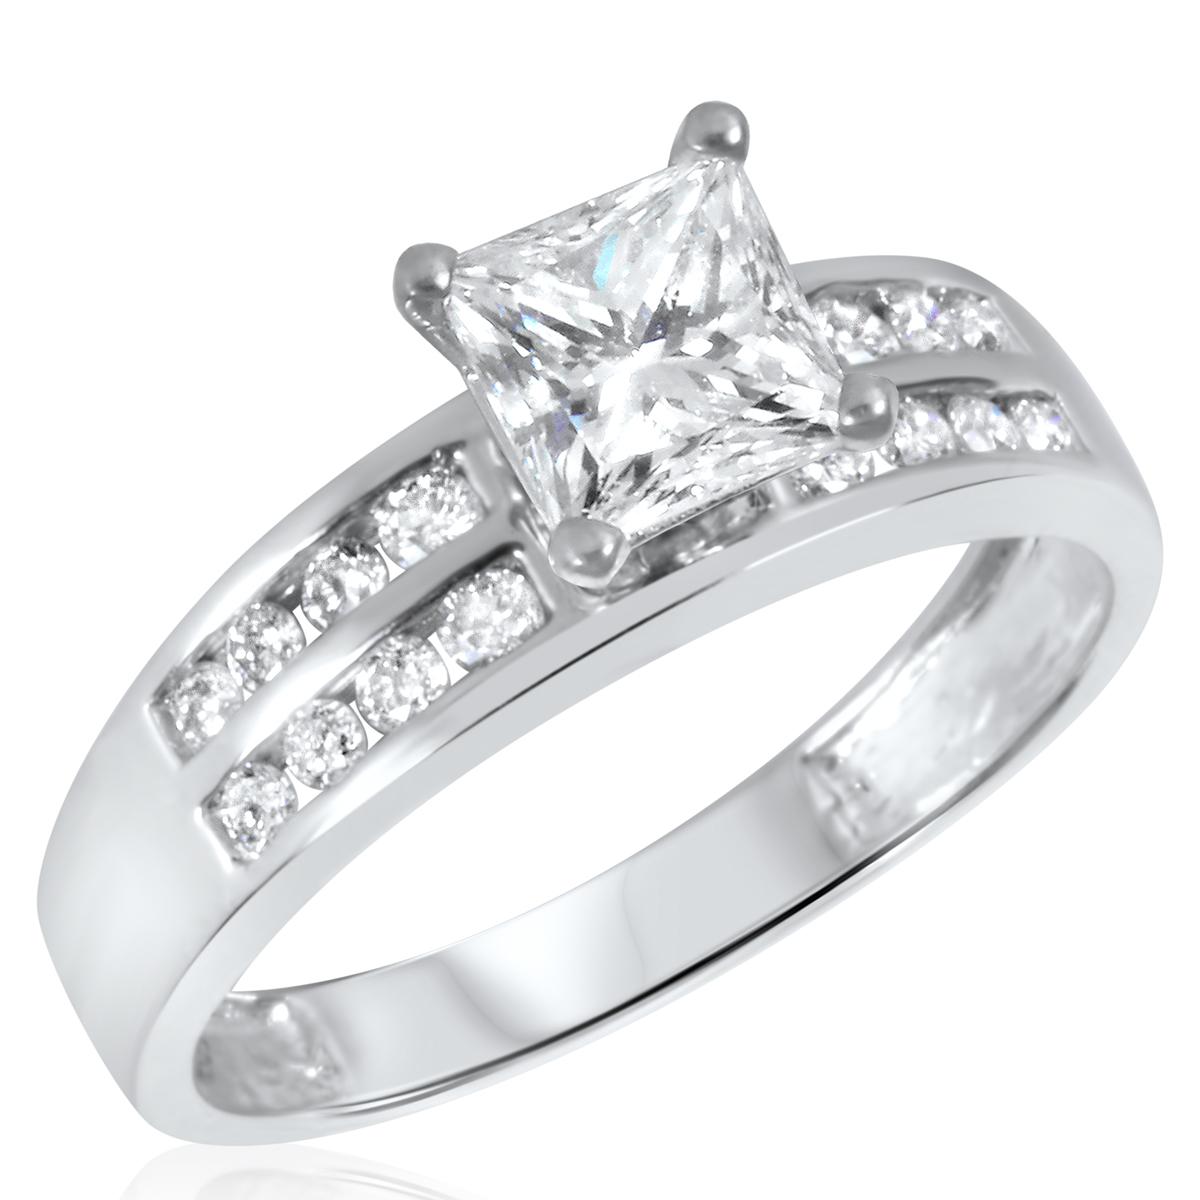 1 1/3 CT. T.W. Diamond Ladies Engagement Ring 14K White Gold- Size 8